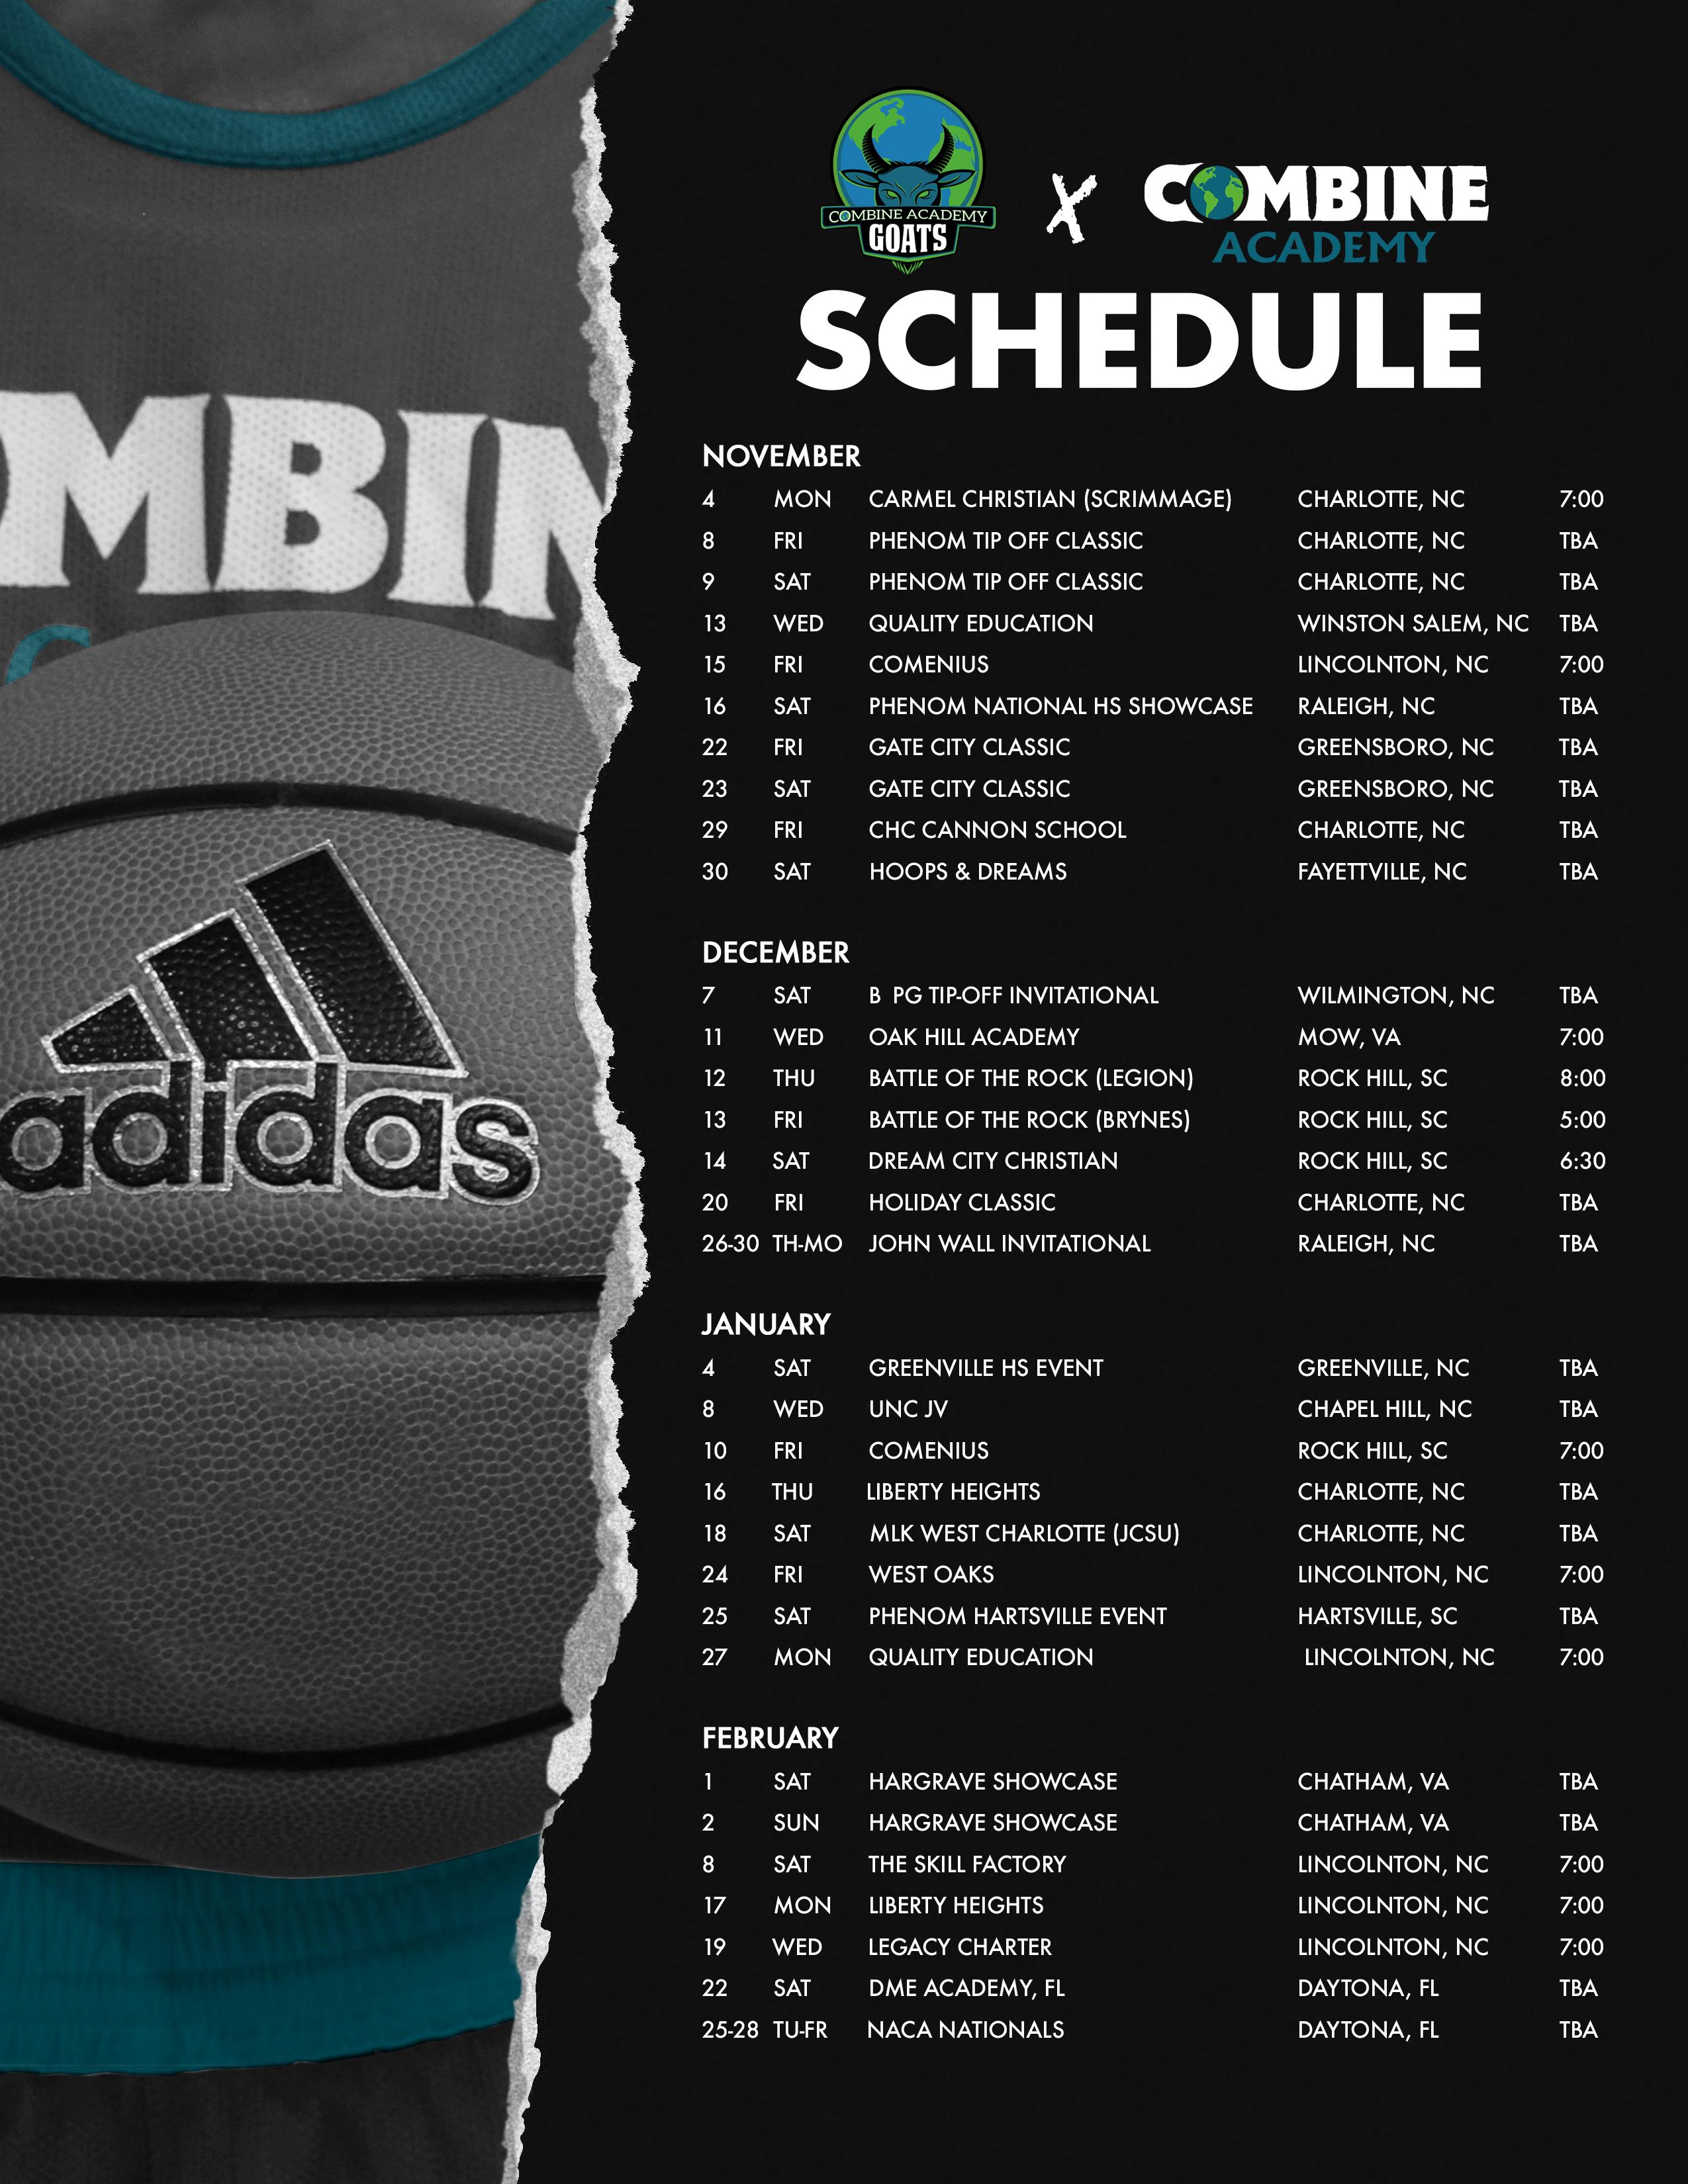 2020 Basketball National Schedule